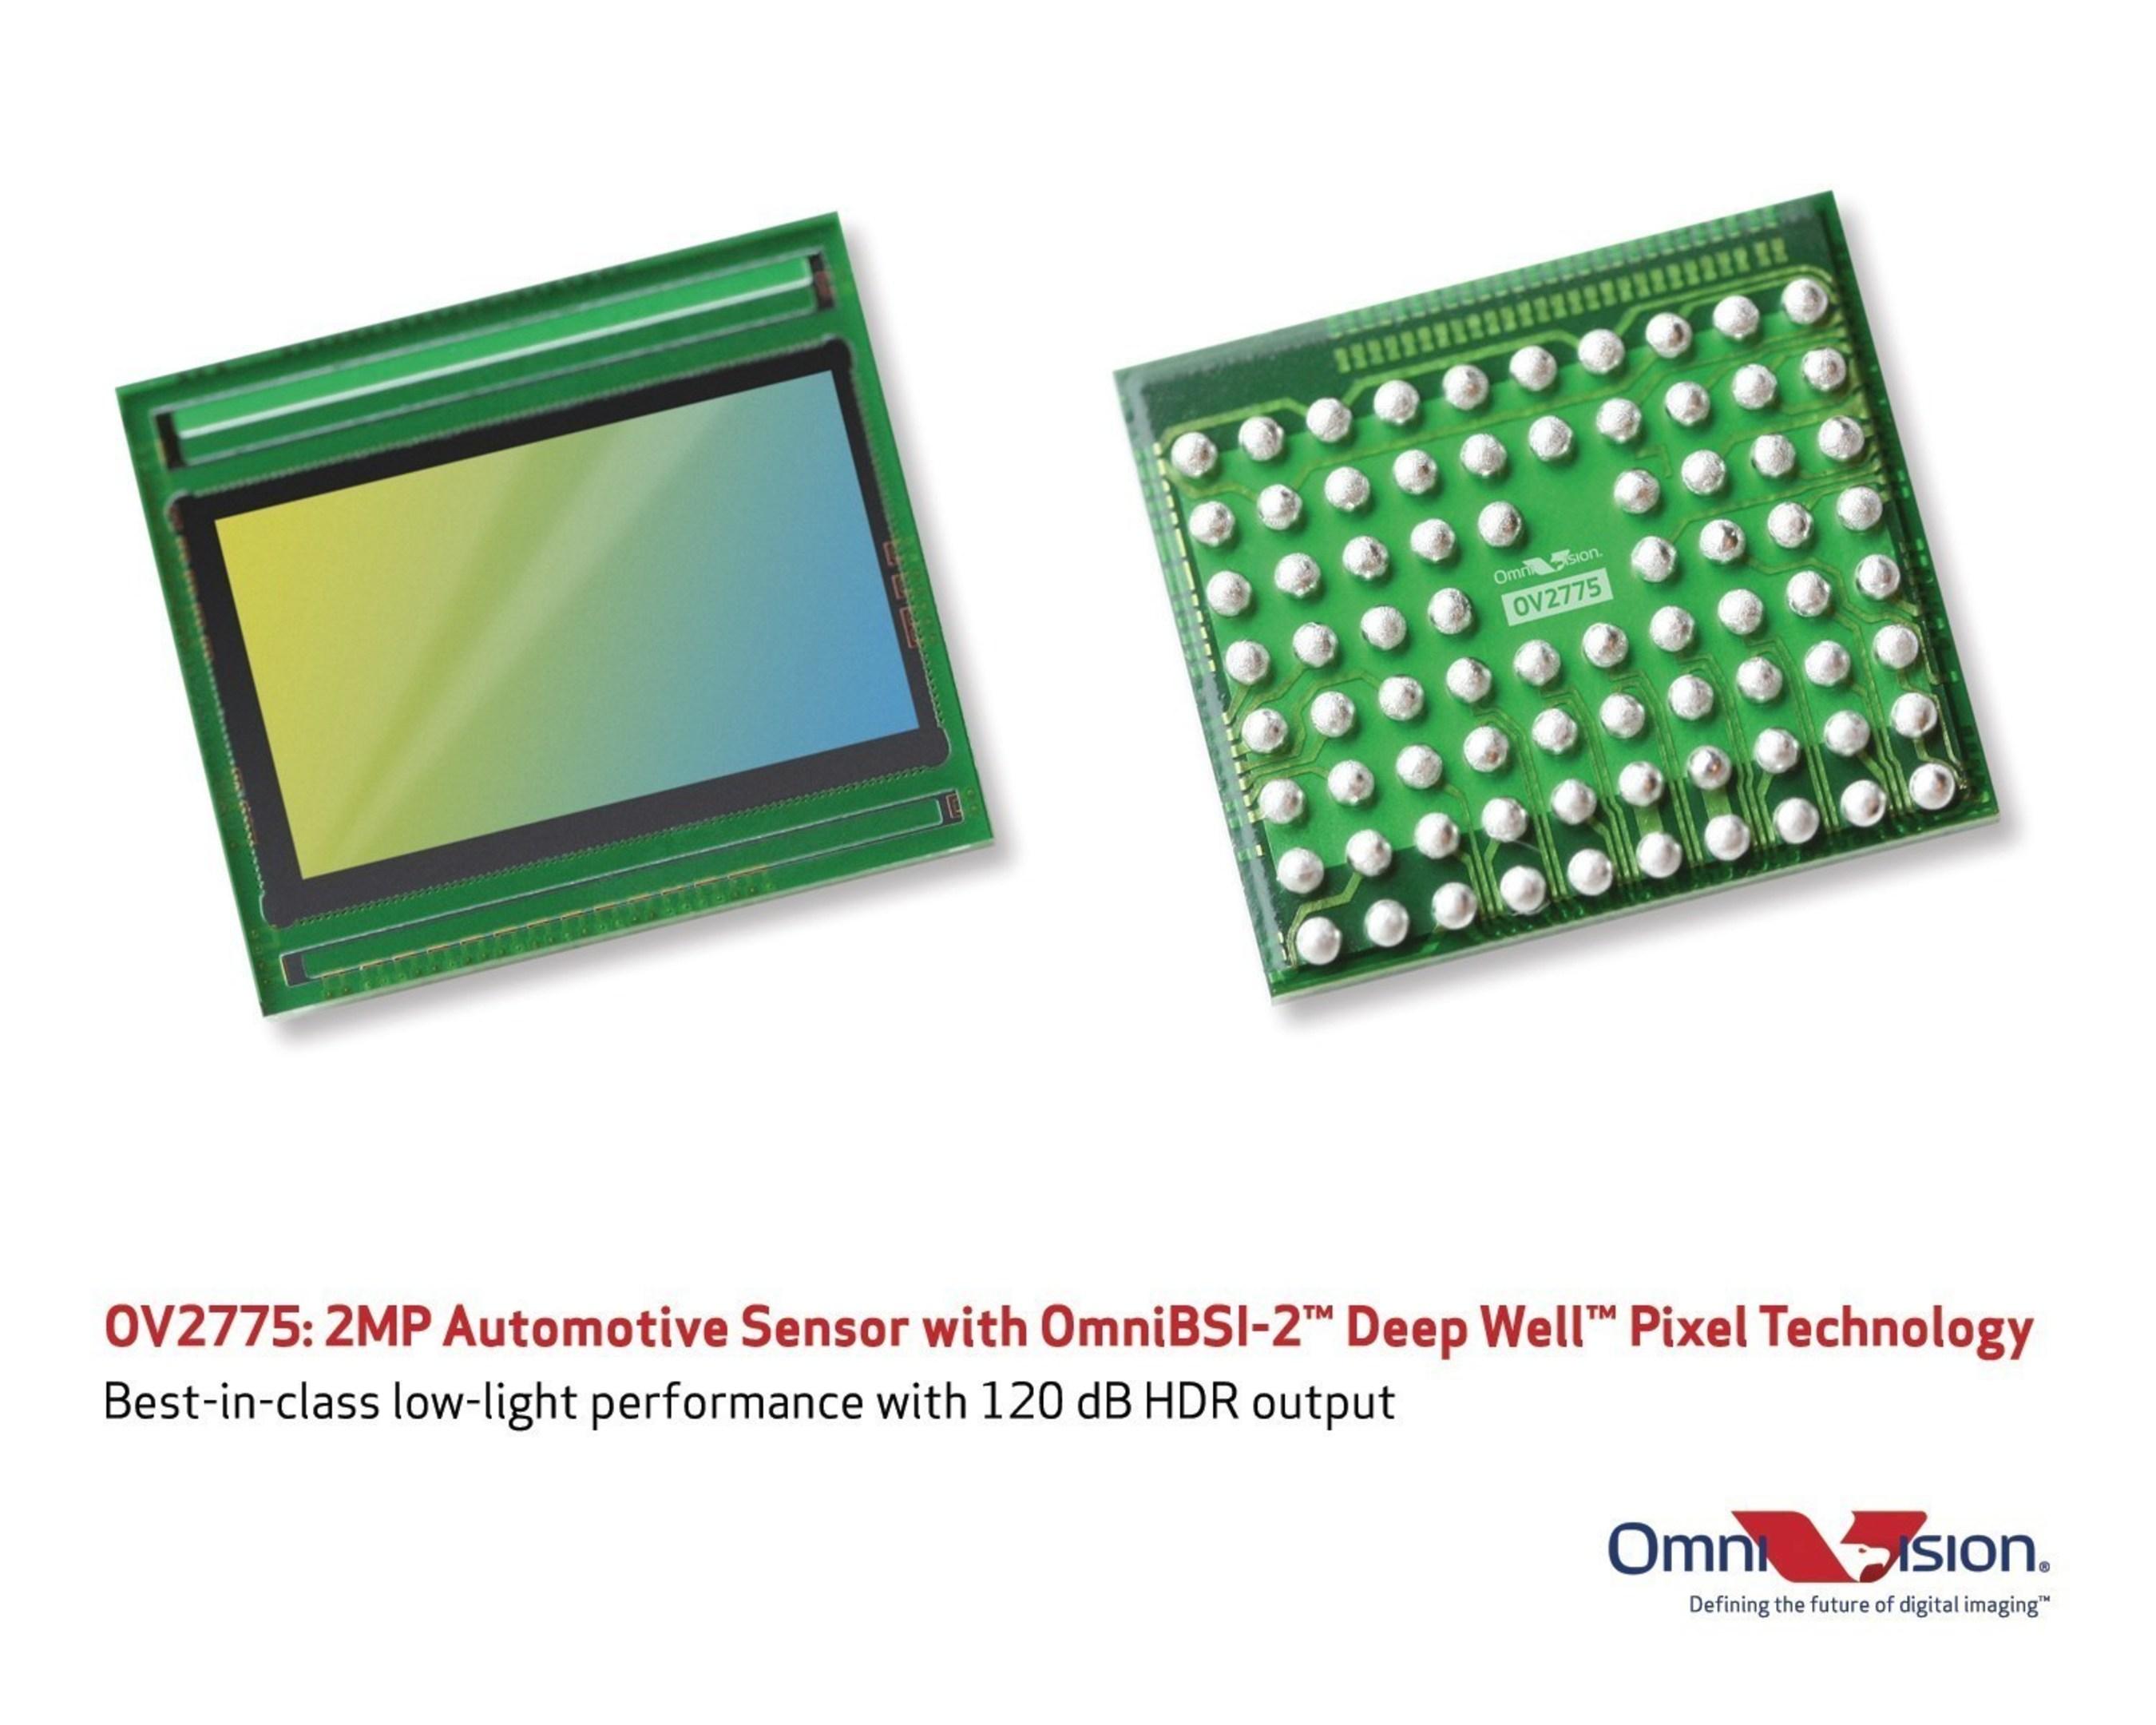 The OV2775, OmniVision's 2-megapixel automotive sensor with OmniBSI-2(TM) Deep Well(TM) pixel technology